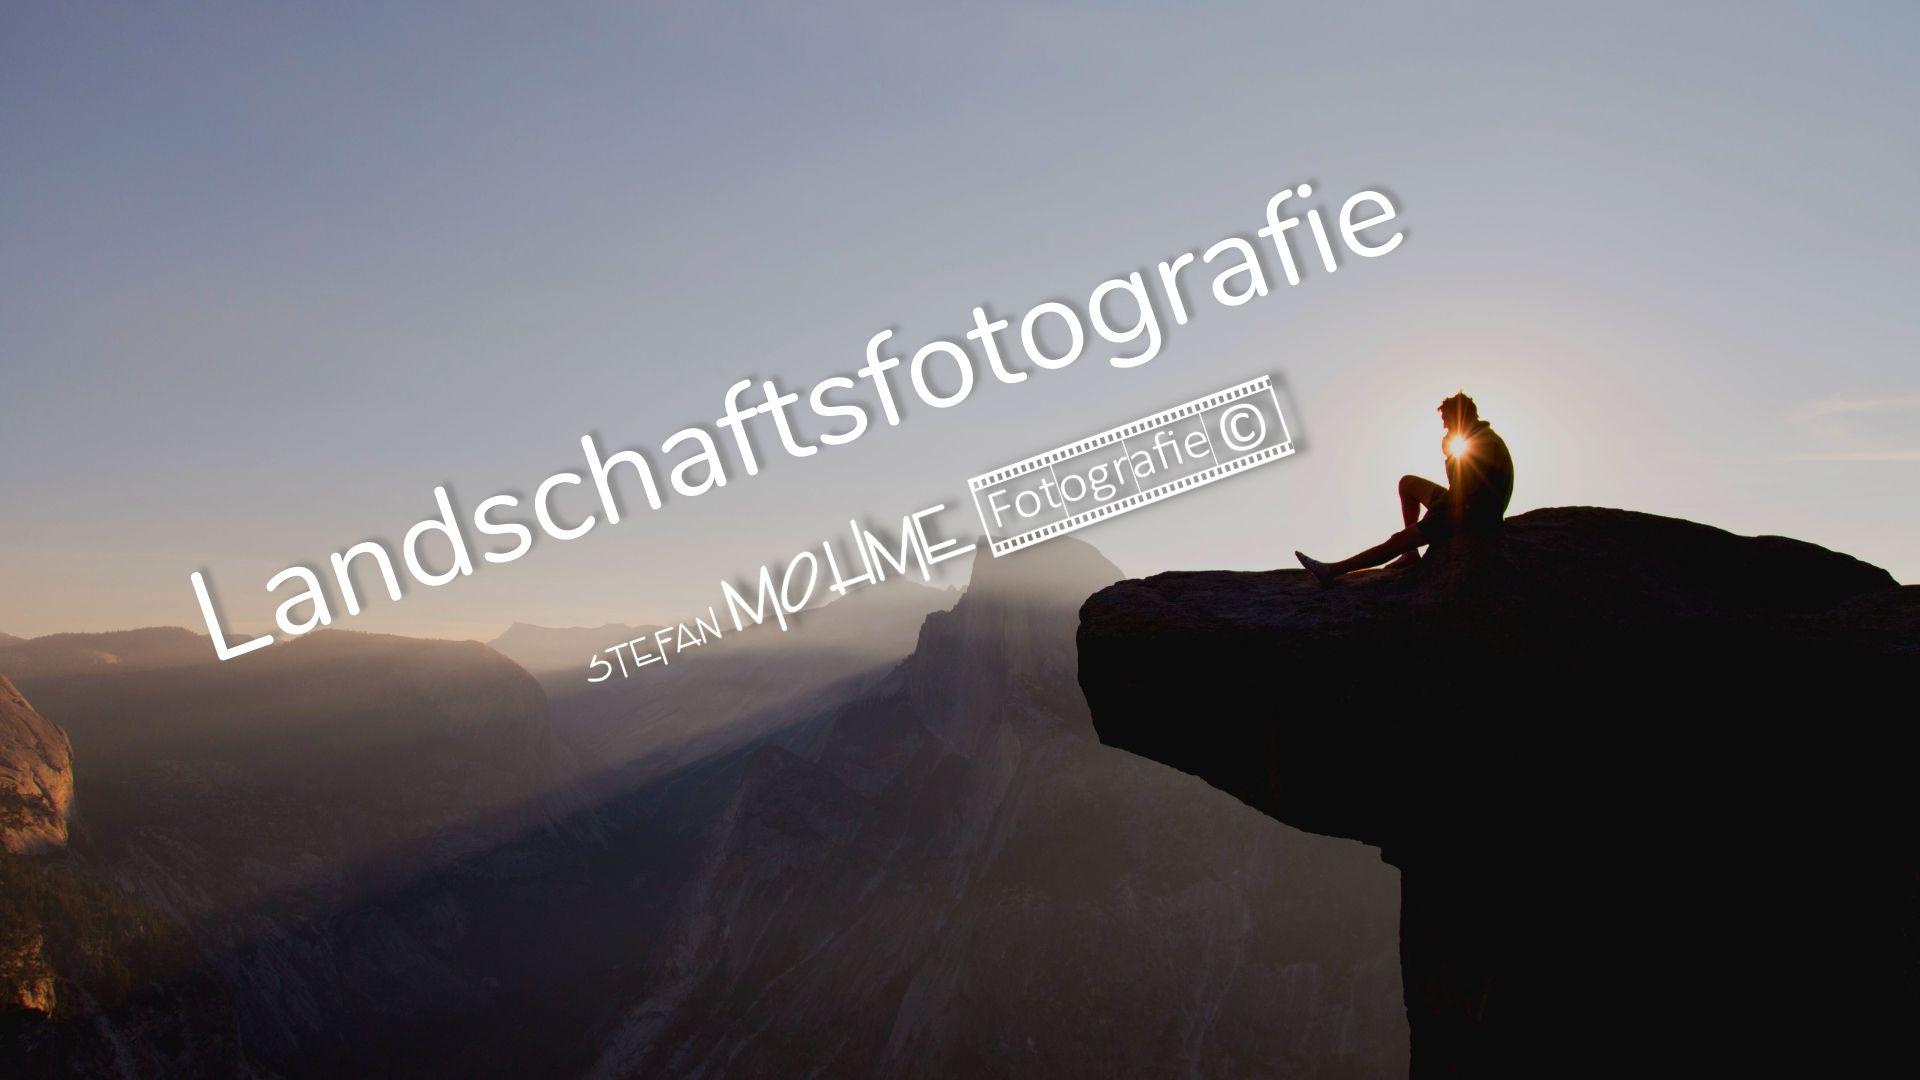 Landschaftsfotografie, mein Praxislehrgang, Teil 1 Kamera und Objektive